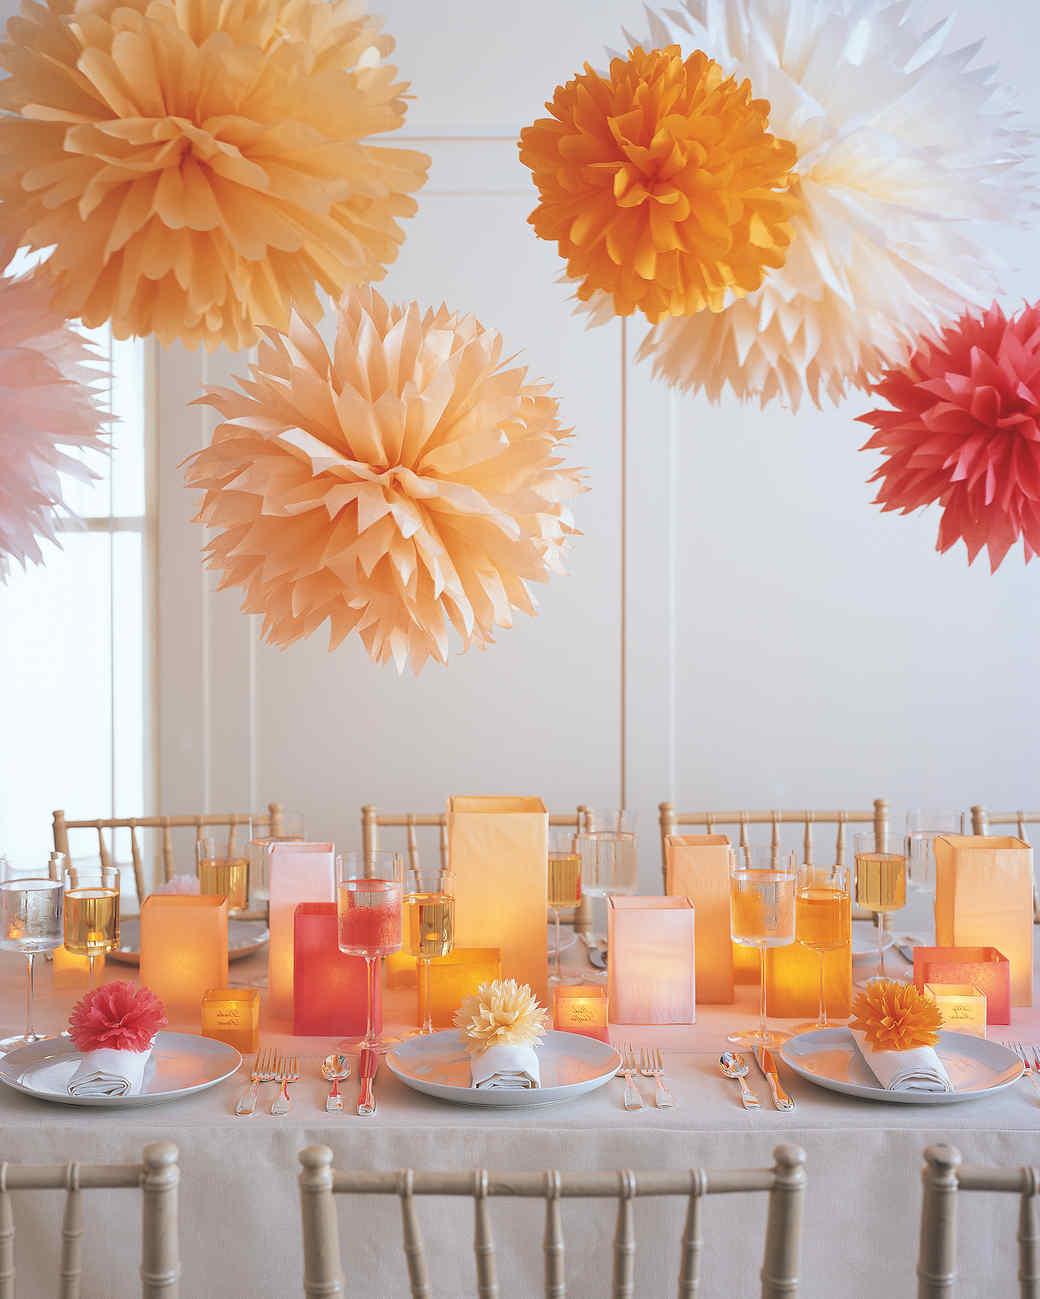 Pompoms basteln als Party-Dekoration